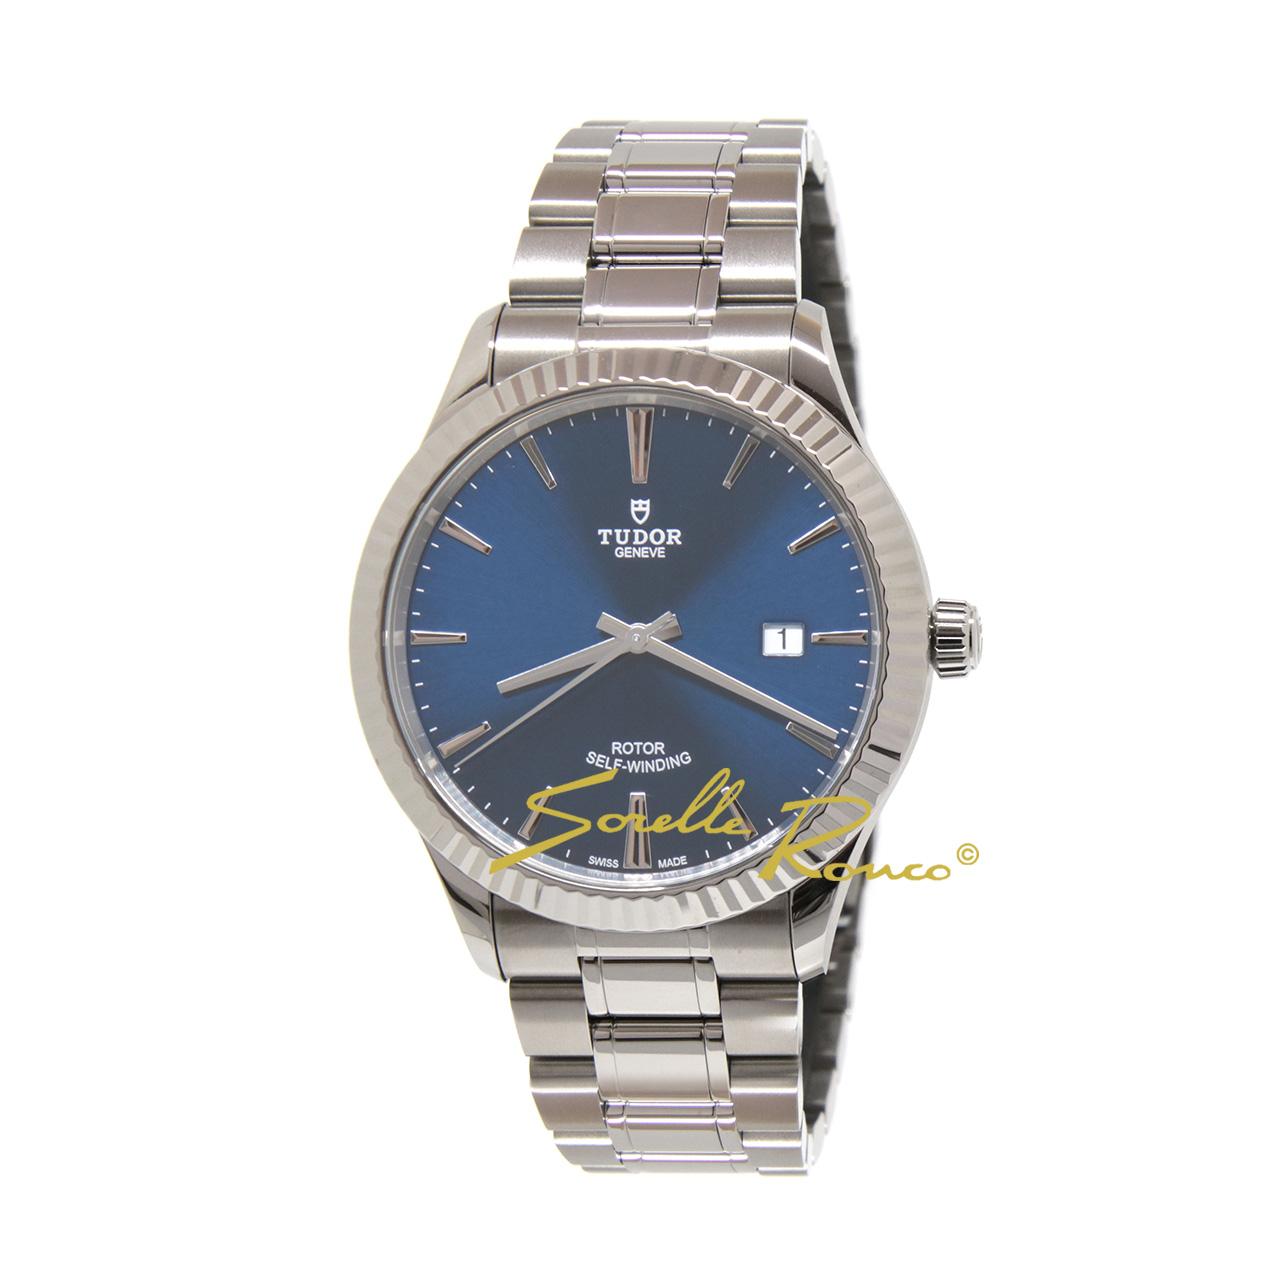 Style Date Blu Acciaio 41mm